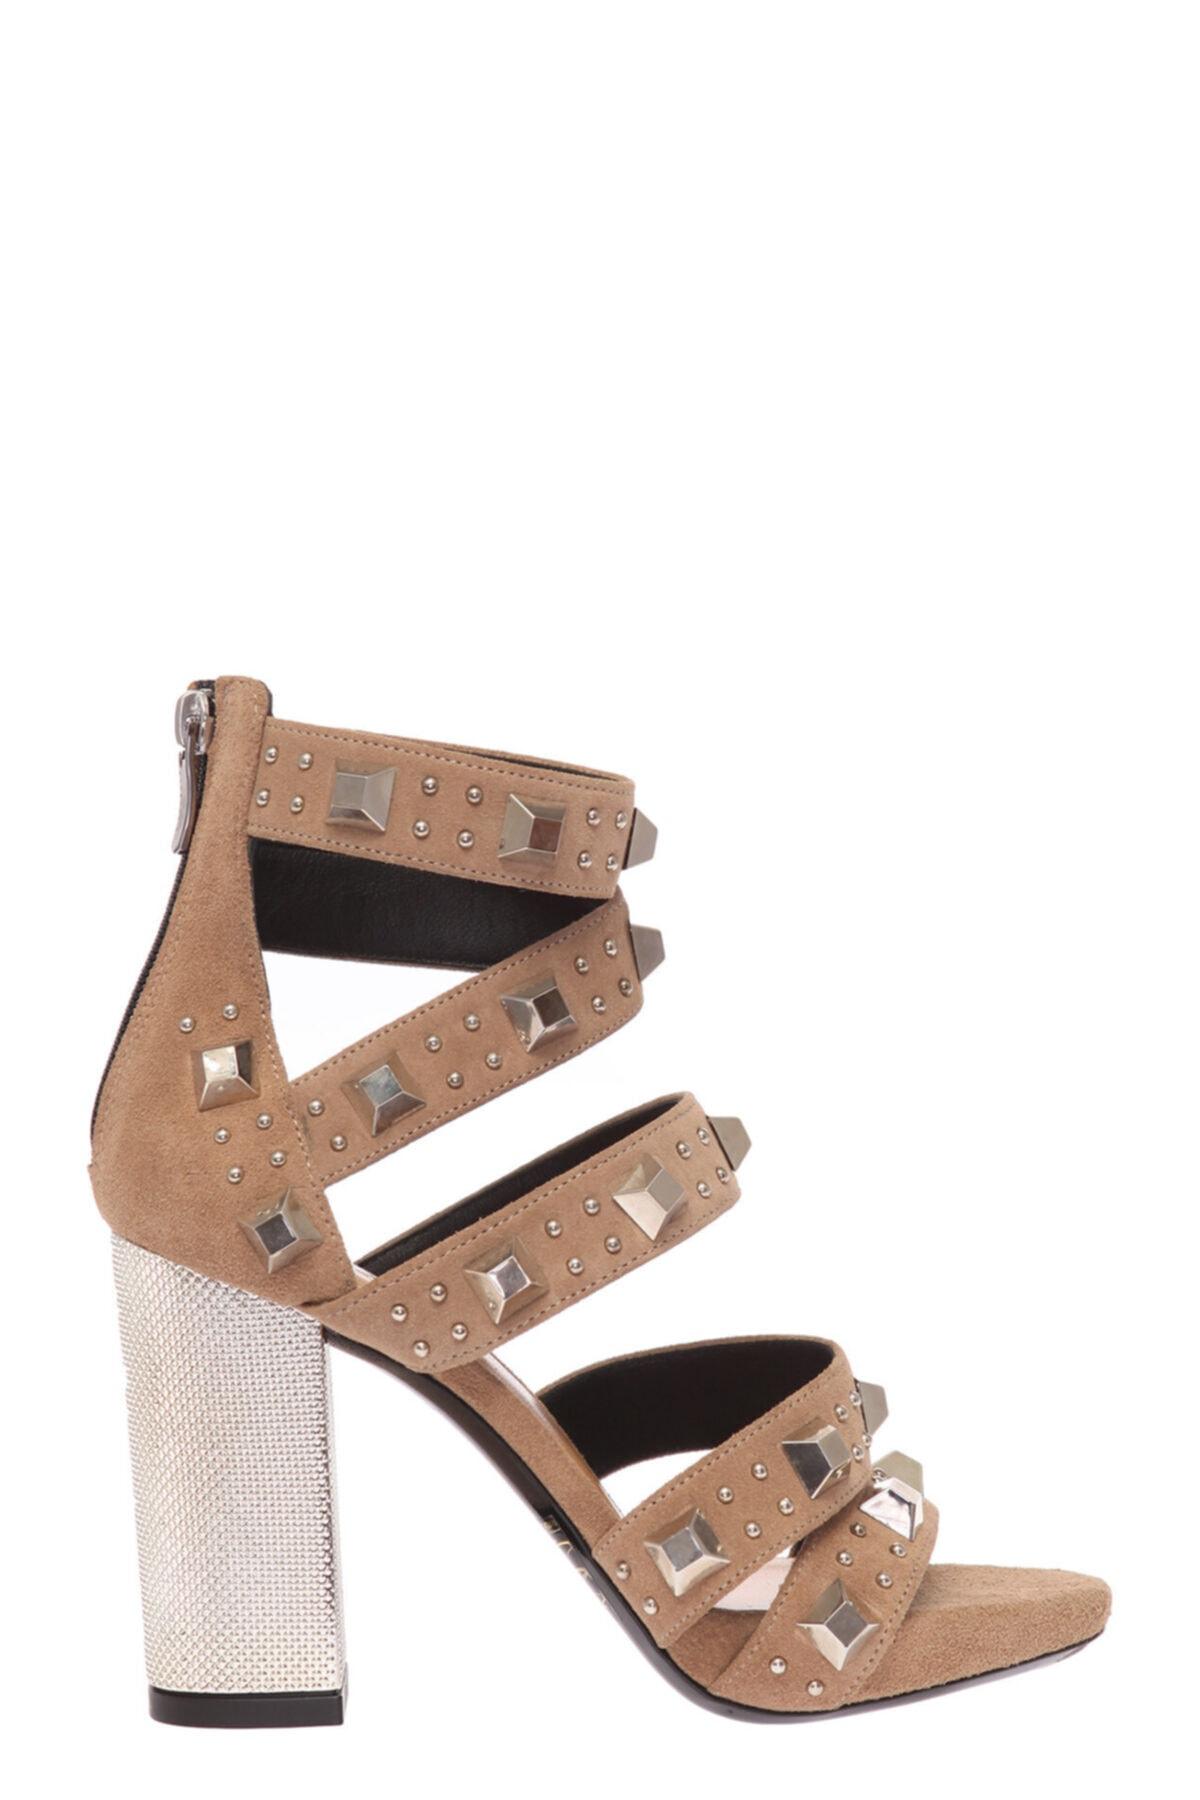 Barbara Bui Bej Sandalet 2